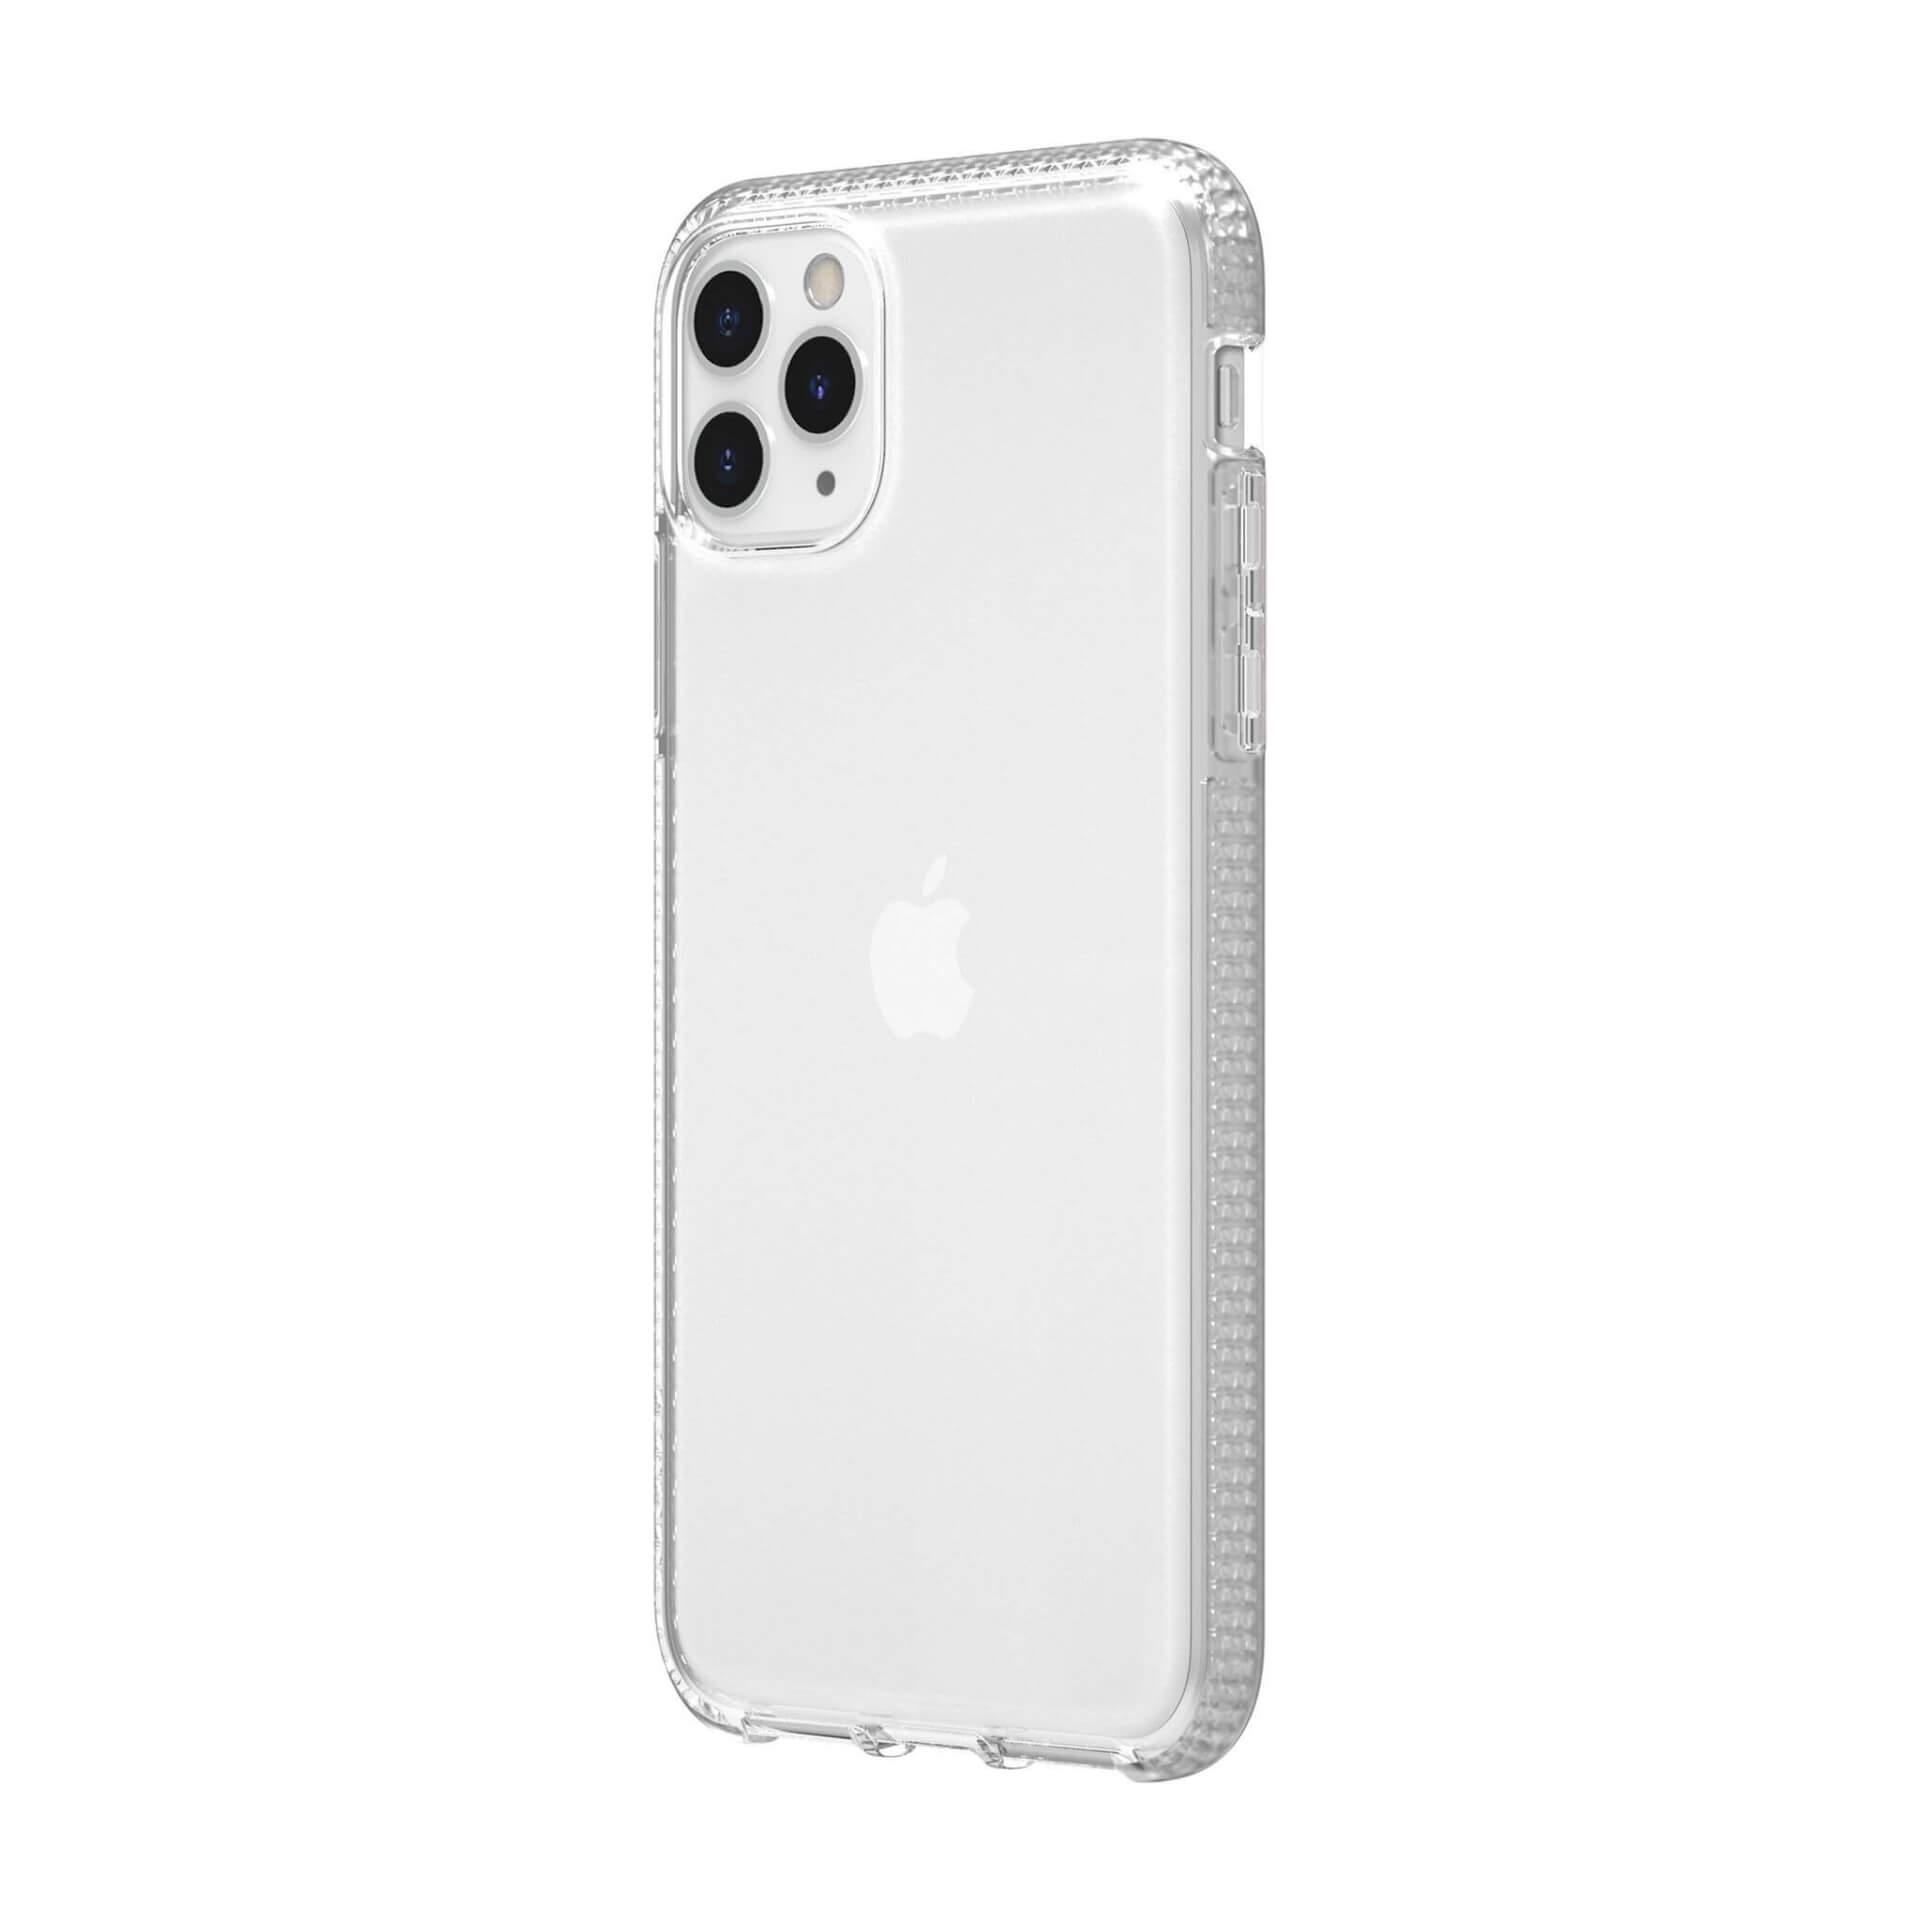 Griffin Survivor Clear Case — хибриден удароустойчив кейс за iPhone 11 Pro Max (прозрачен) - 4